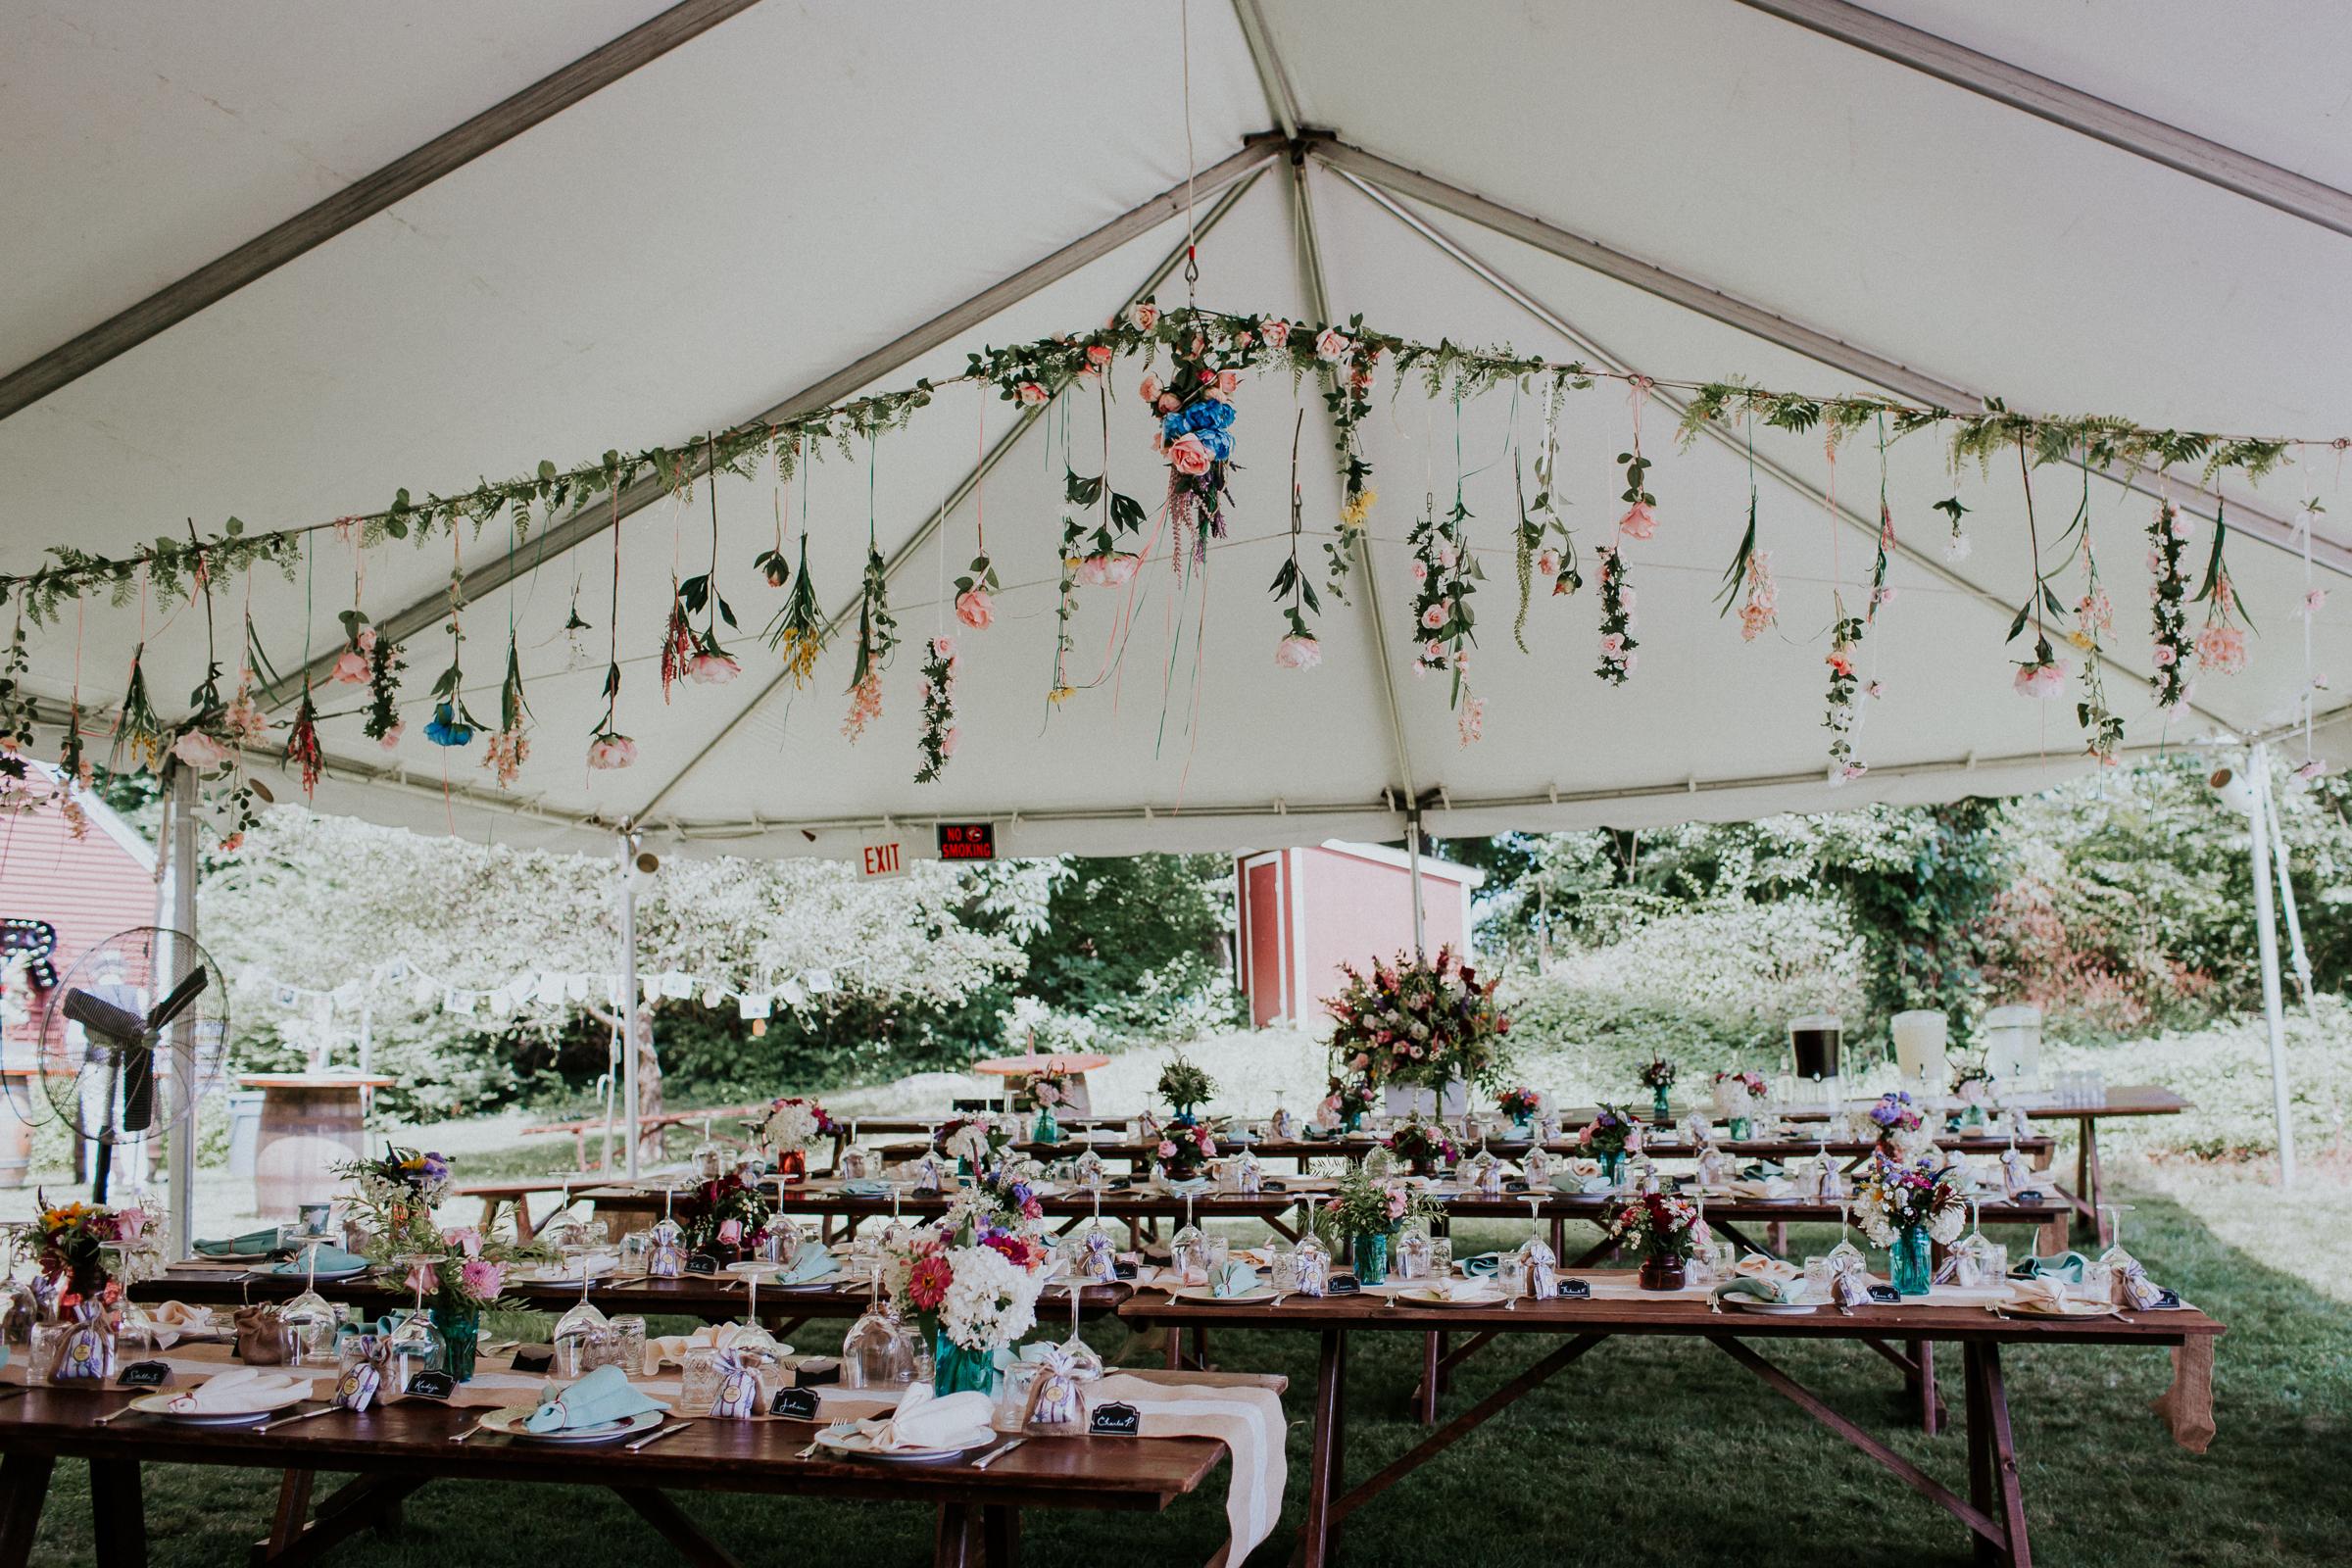 Backyard-Intimate-Adventurous-Destination-Wedding-Darien-Connecticut-Documentary-Wedding-Photography-37.jpg